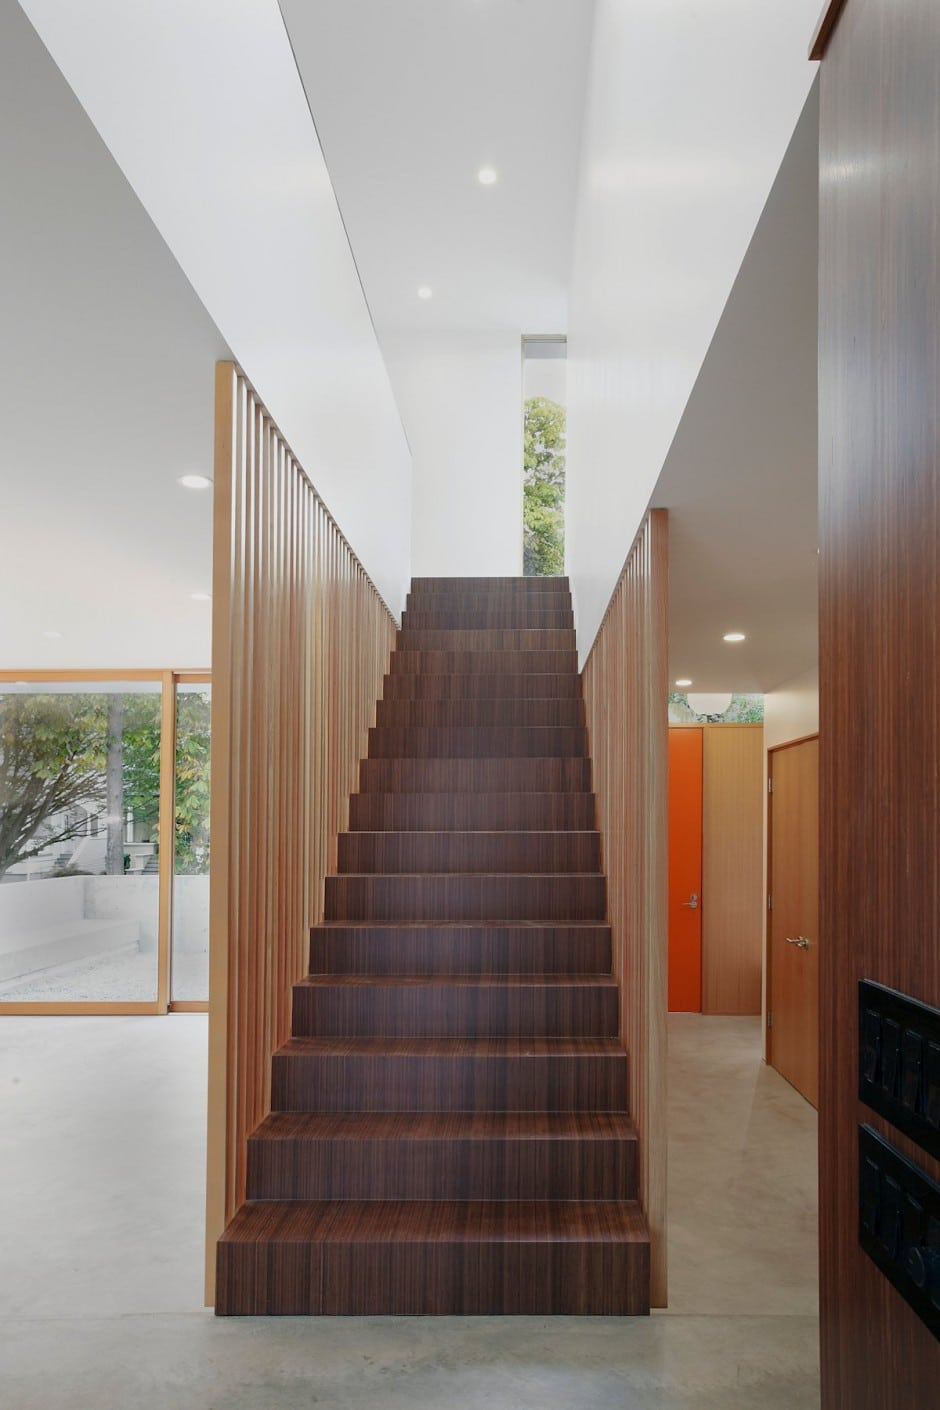 Planos de casa de dos pisos en terreno peque o construye for Tipos de escaleras para casas de 2 pisos